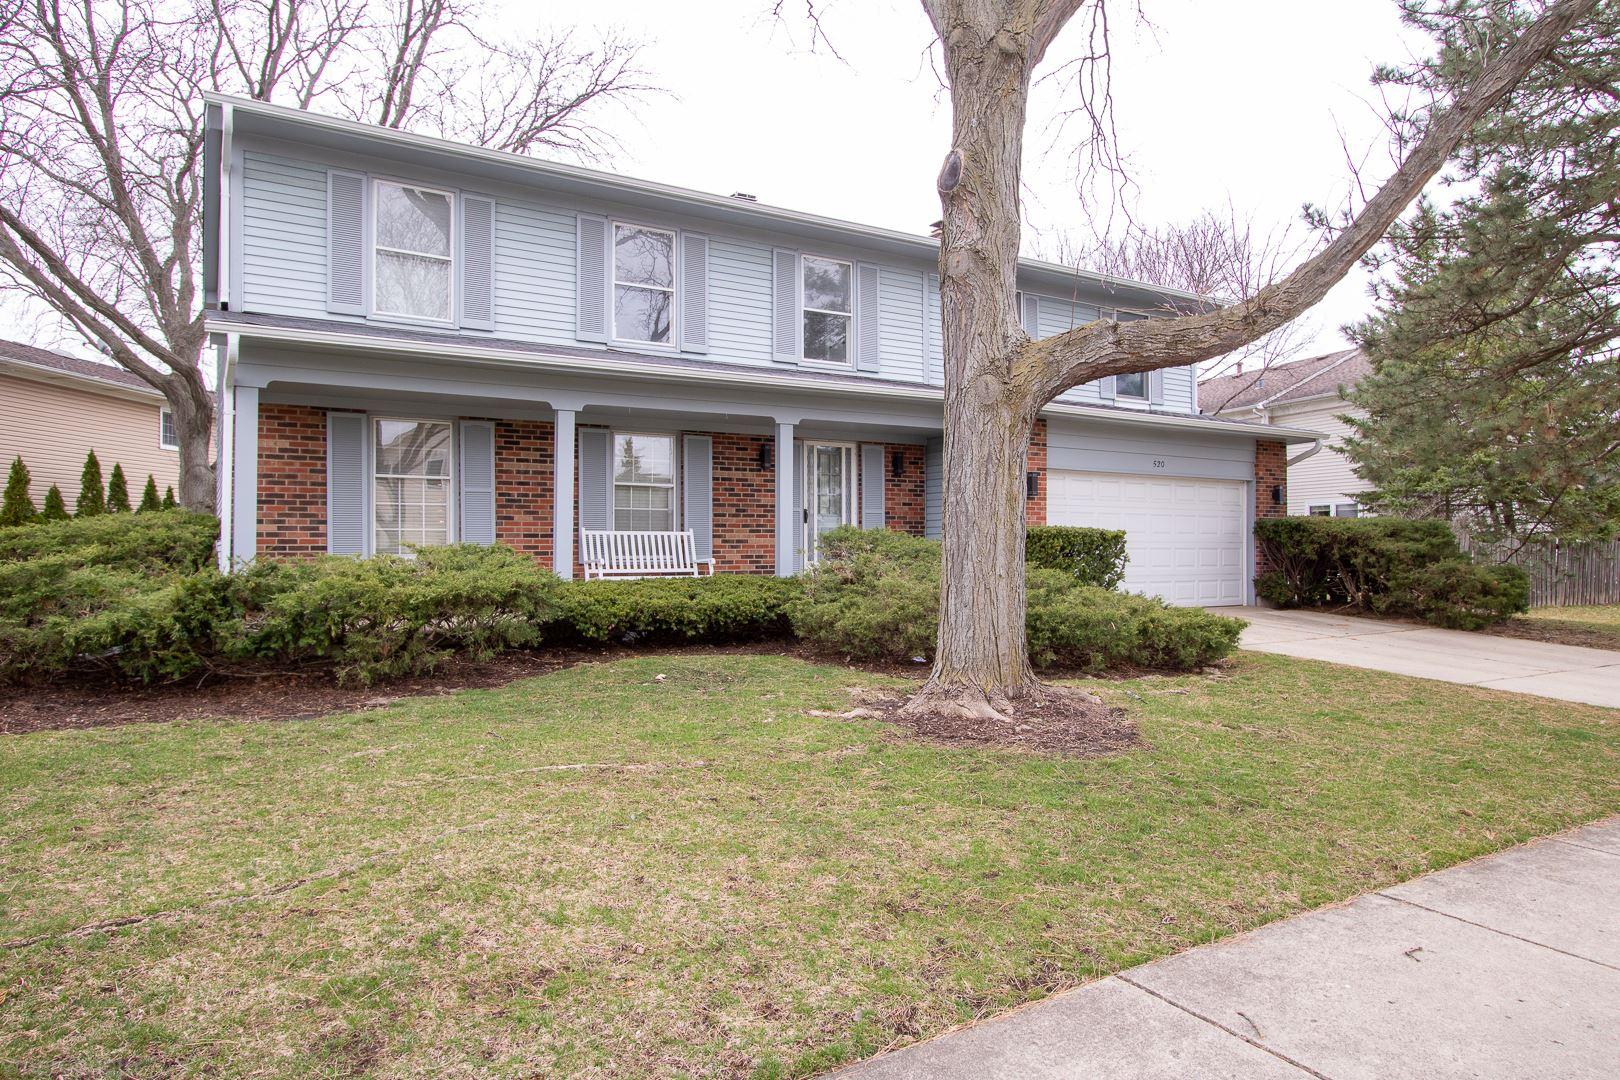 520 Highland Grove Drive, Buffalo Grove, IL 60089 - #: 11026458